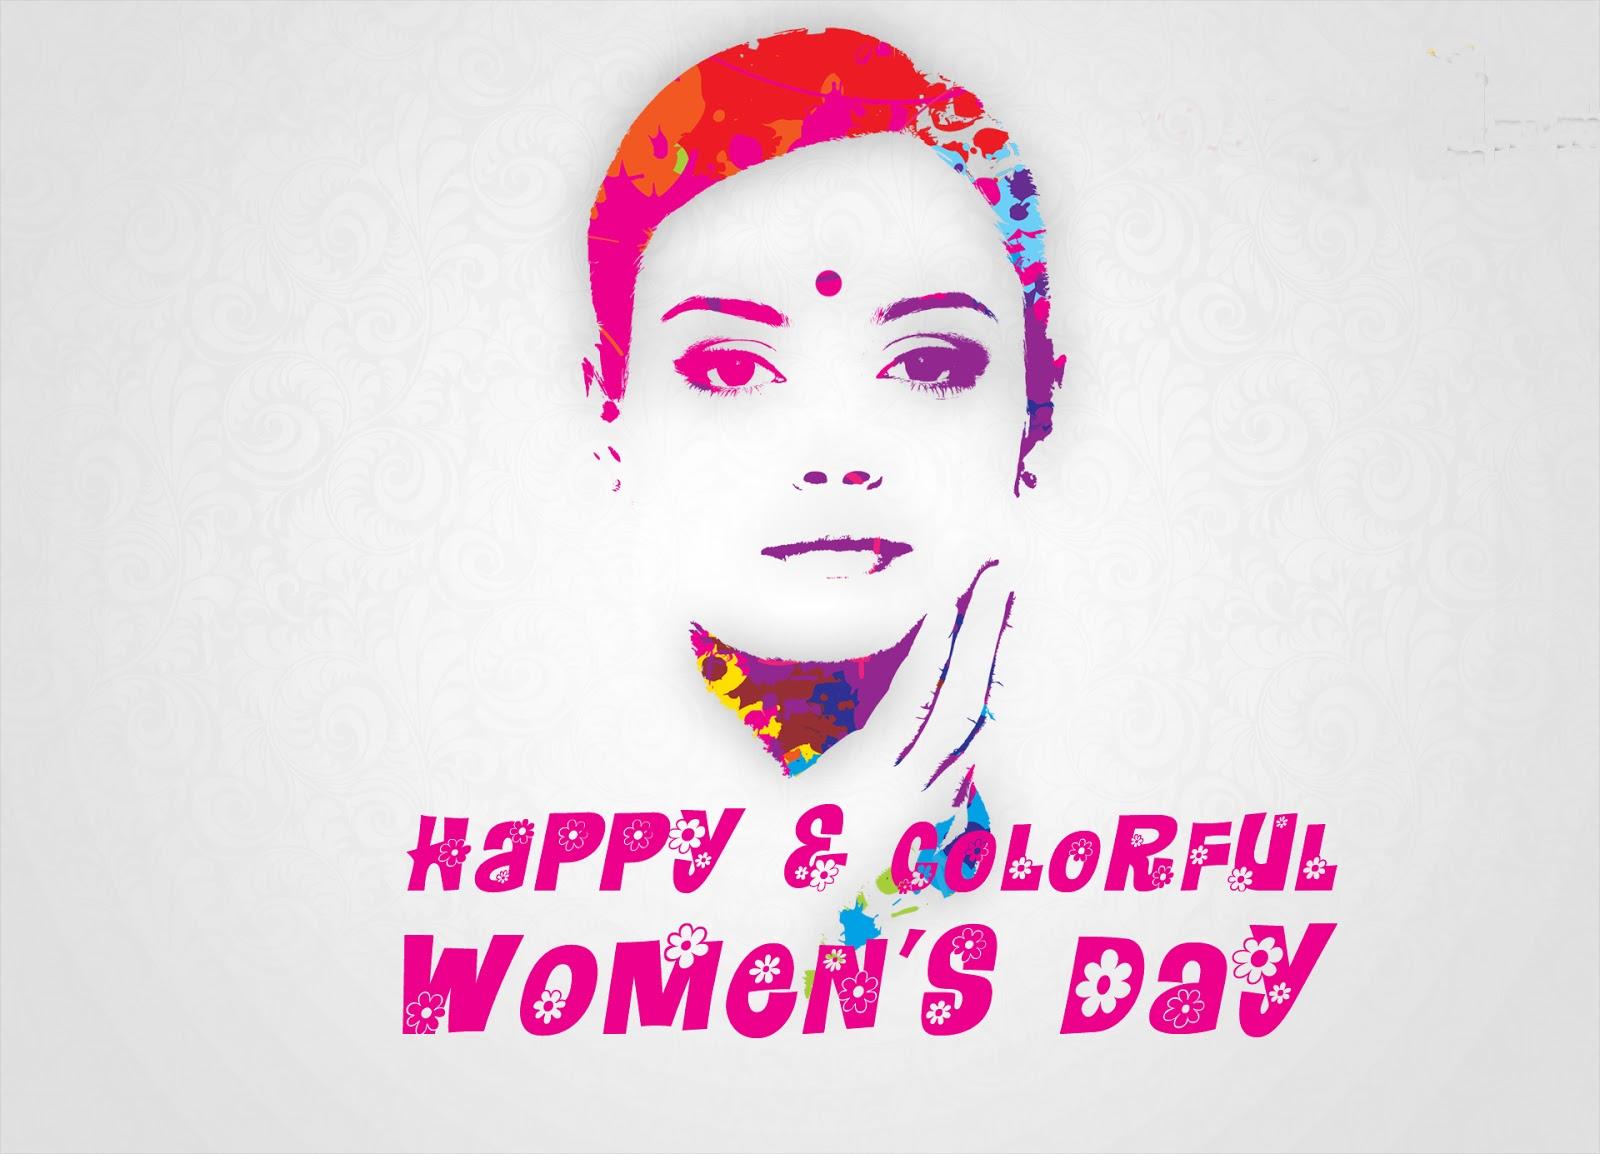 Womens Day Wallpaper 180247 Hd Wallpaper Backgrounds